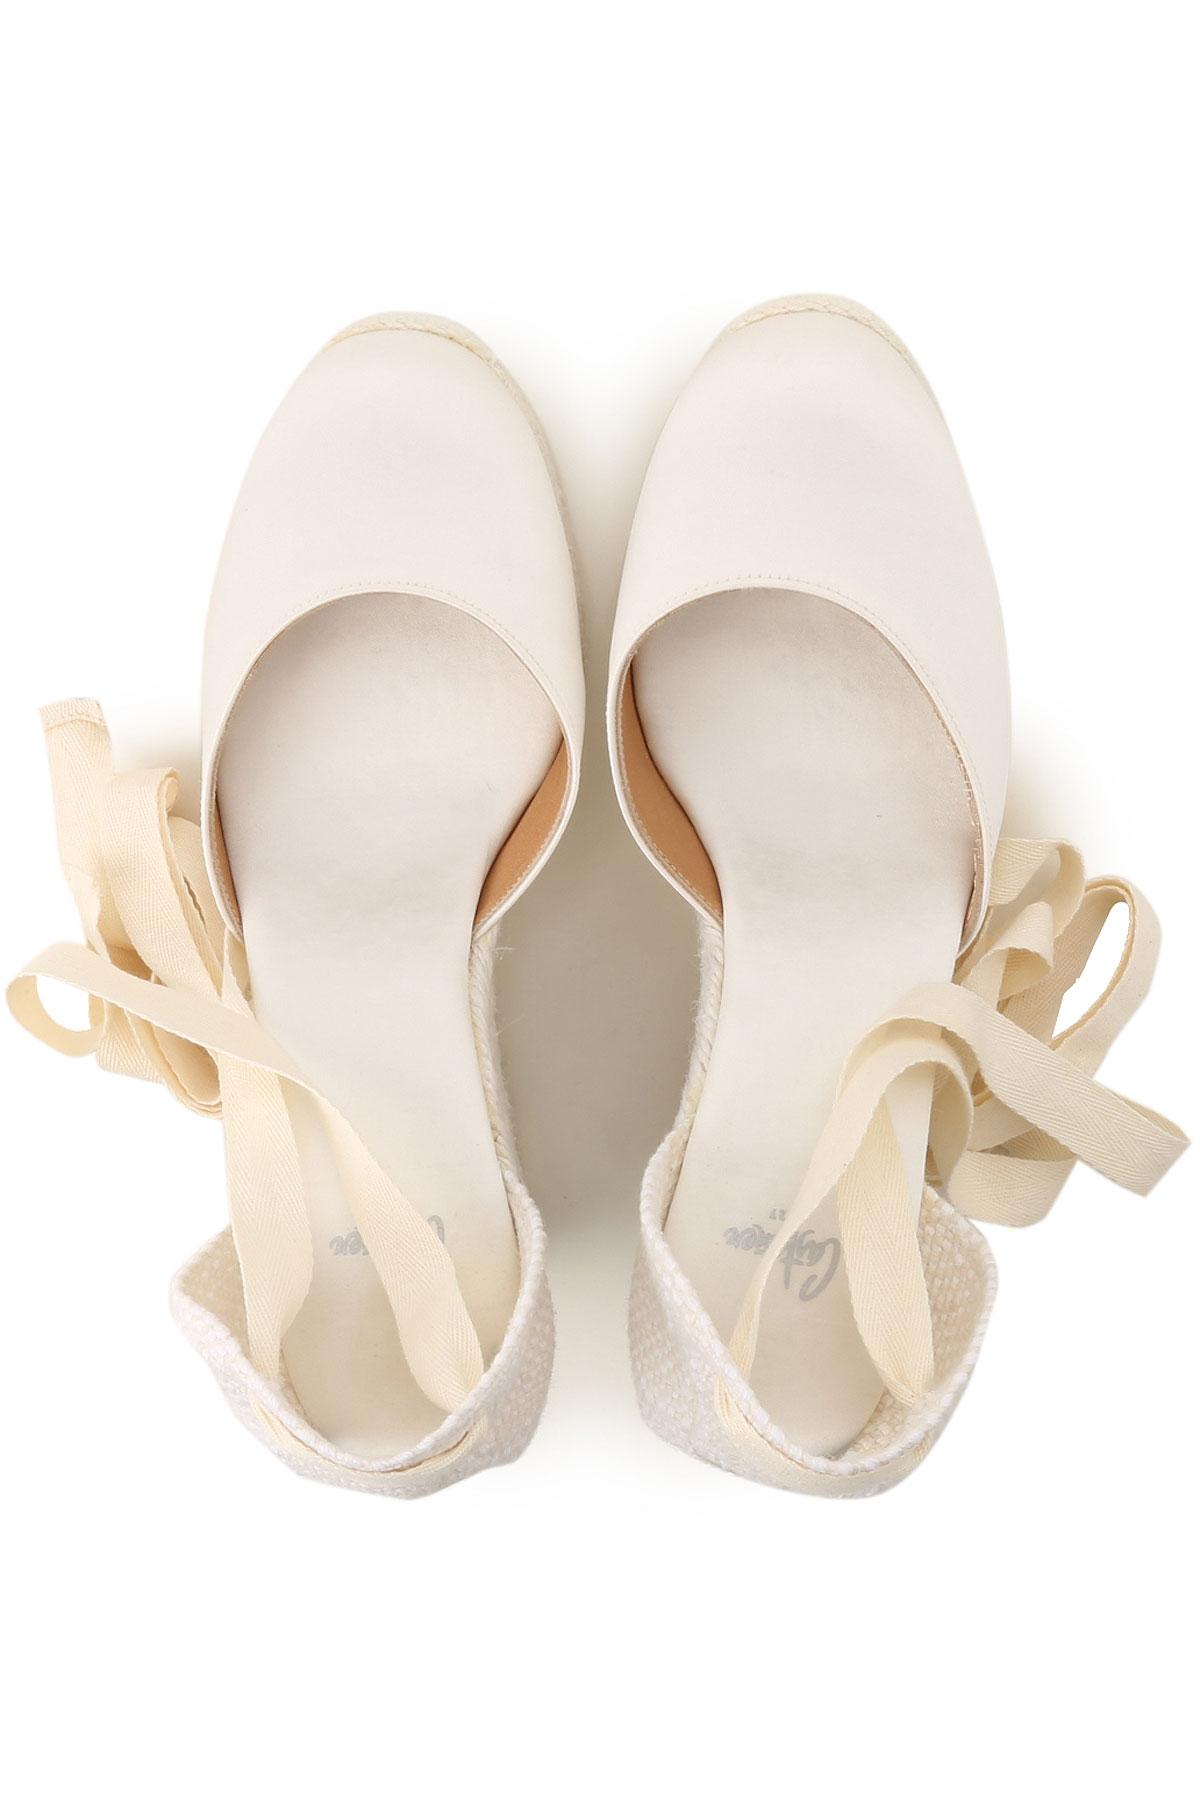 Primavera Blanco Para Castaner verano Mujer óptico 2019 nbsp; Zapatos SPxaUZt